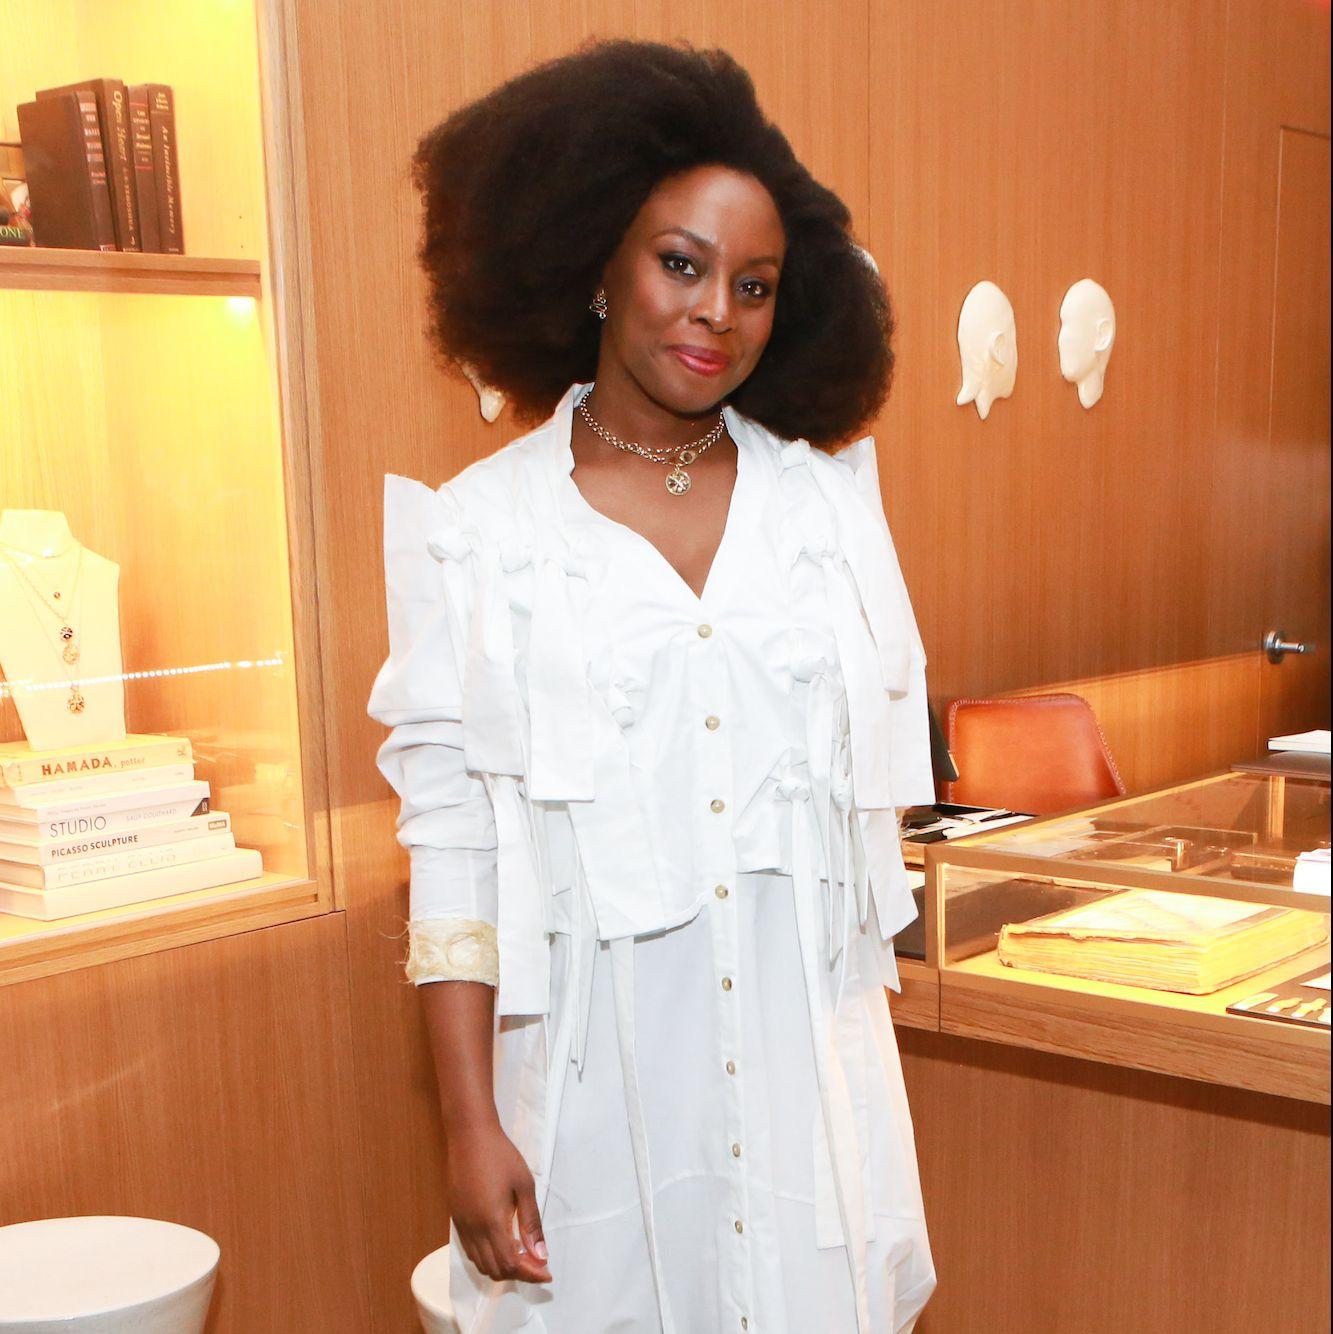 FOUNDRAE Collaborates with Chimamanda Ngozi Adichie: to Celebrate Freedom of Expression and Benefit PEN America